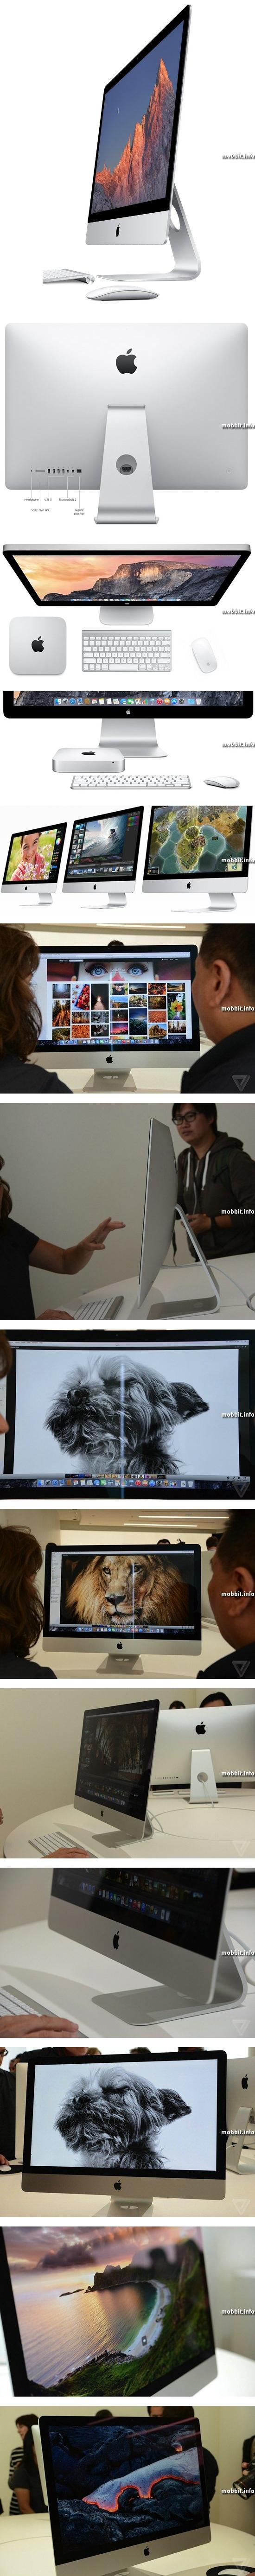 iMac с 5К-дисплеем Retina